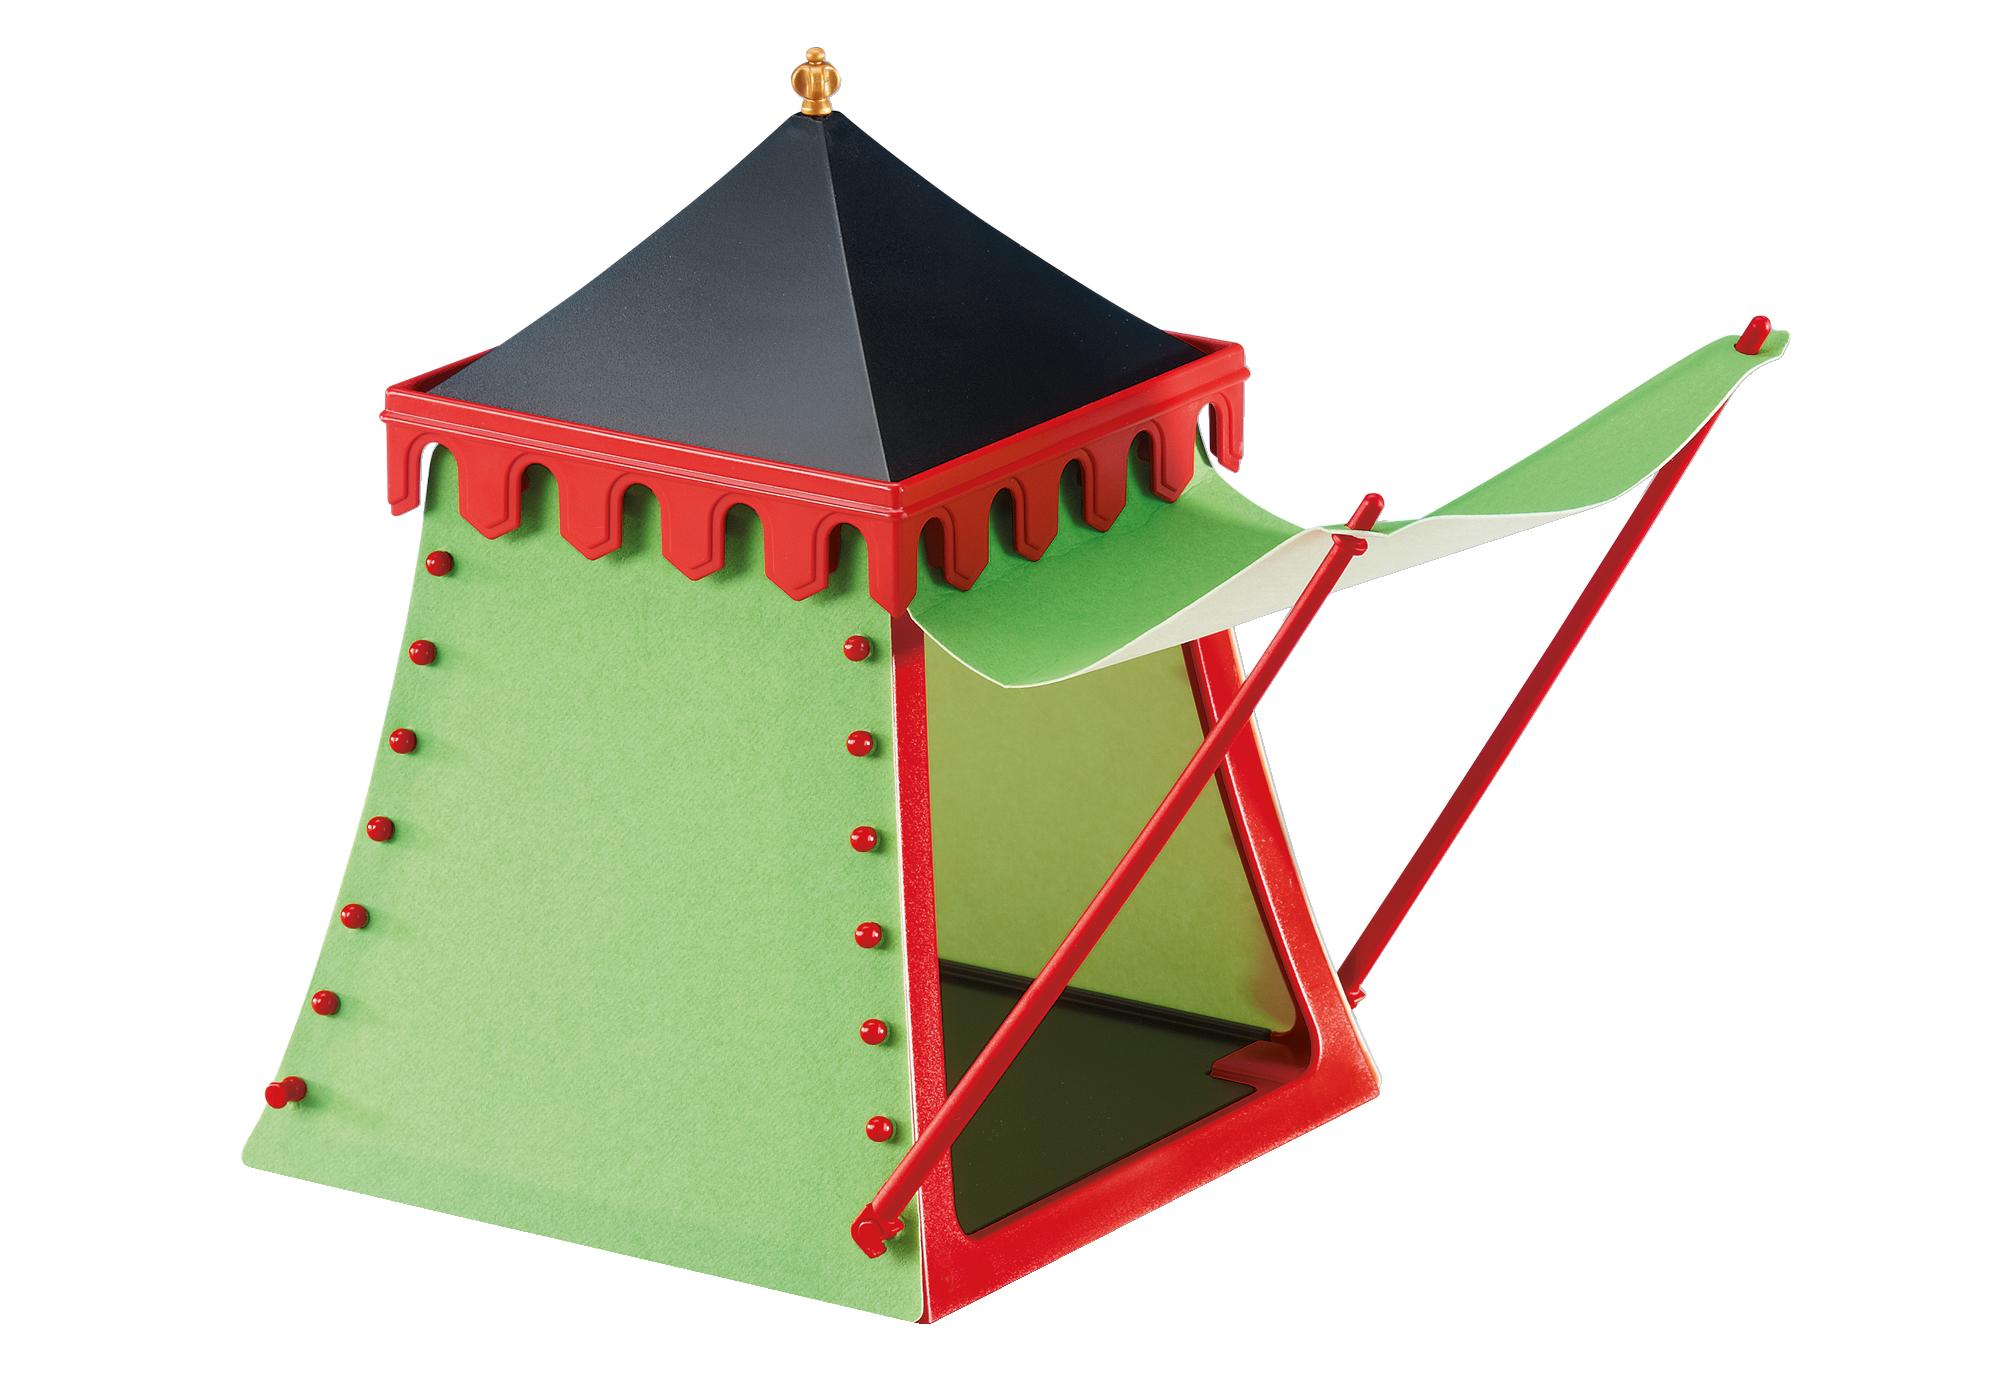 http://media.playmobil.com/i/playmobil/6495_product_detail/Romeinse tent